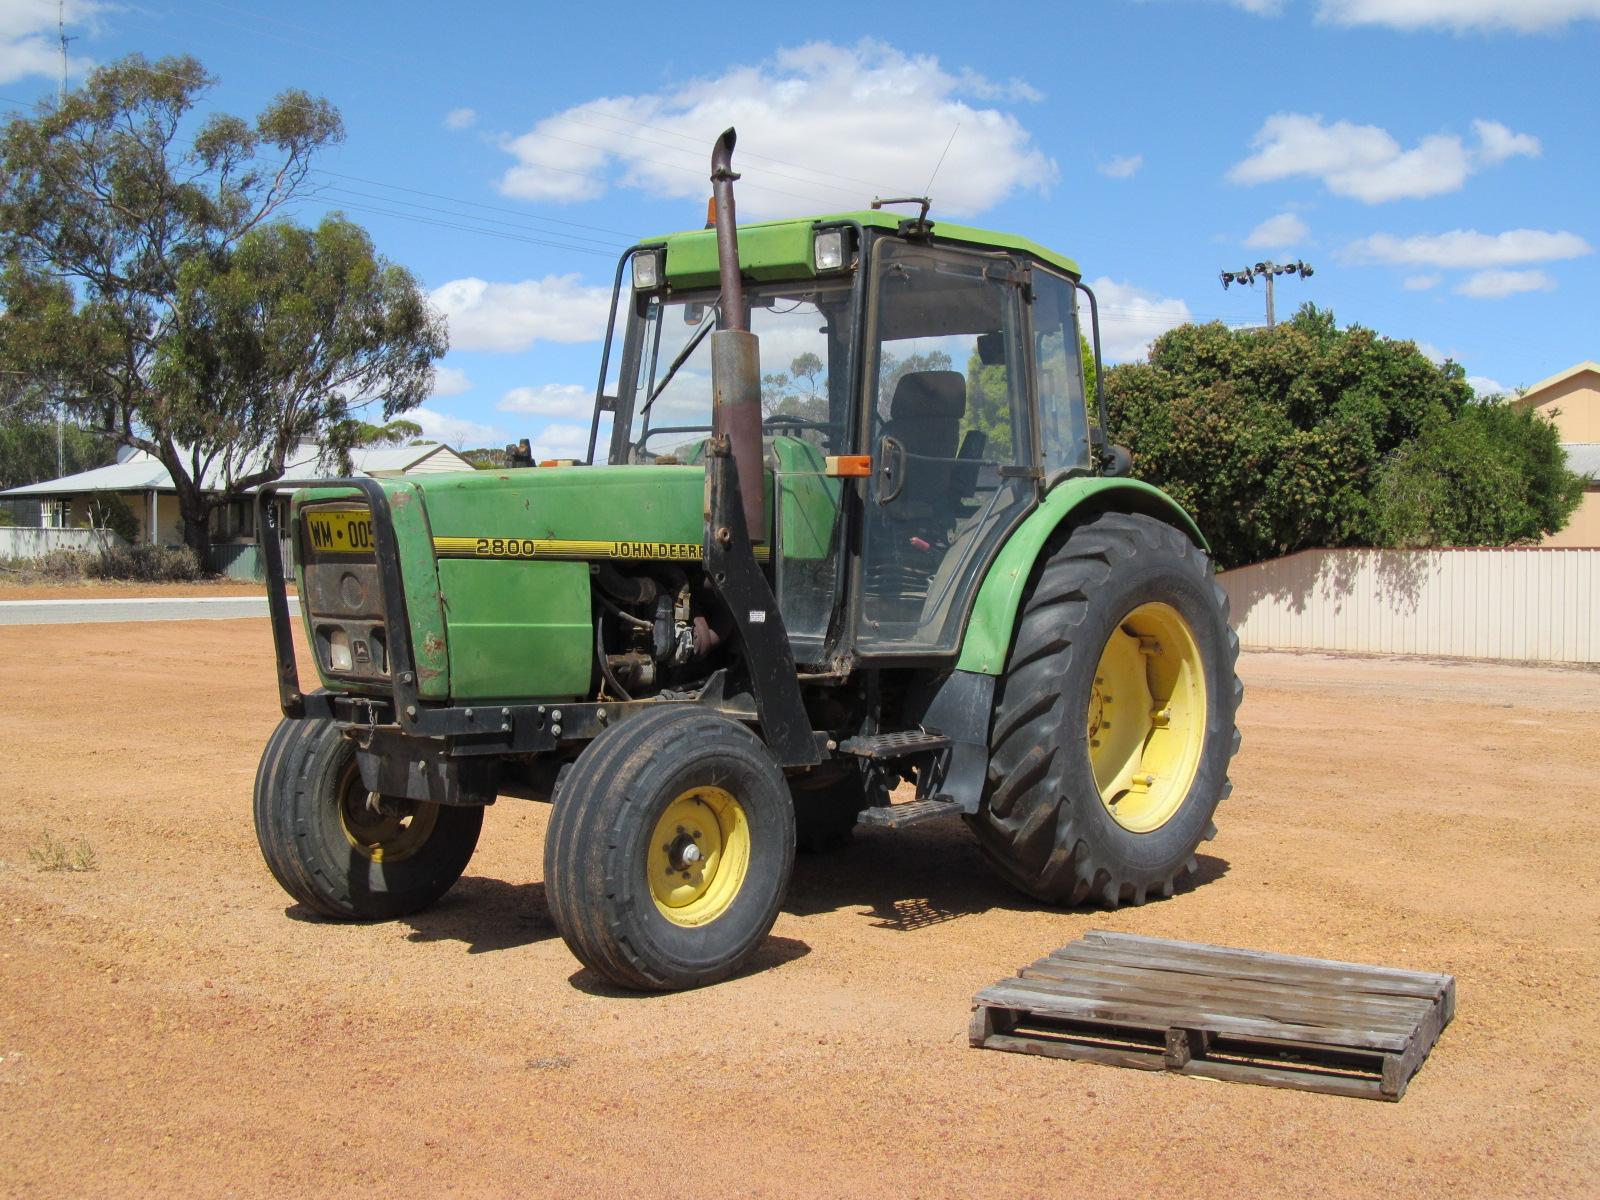 John Deere 2750 Farm Tractor Tractors 2240 Wiring Diagram 2800 Wikimedia Commons